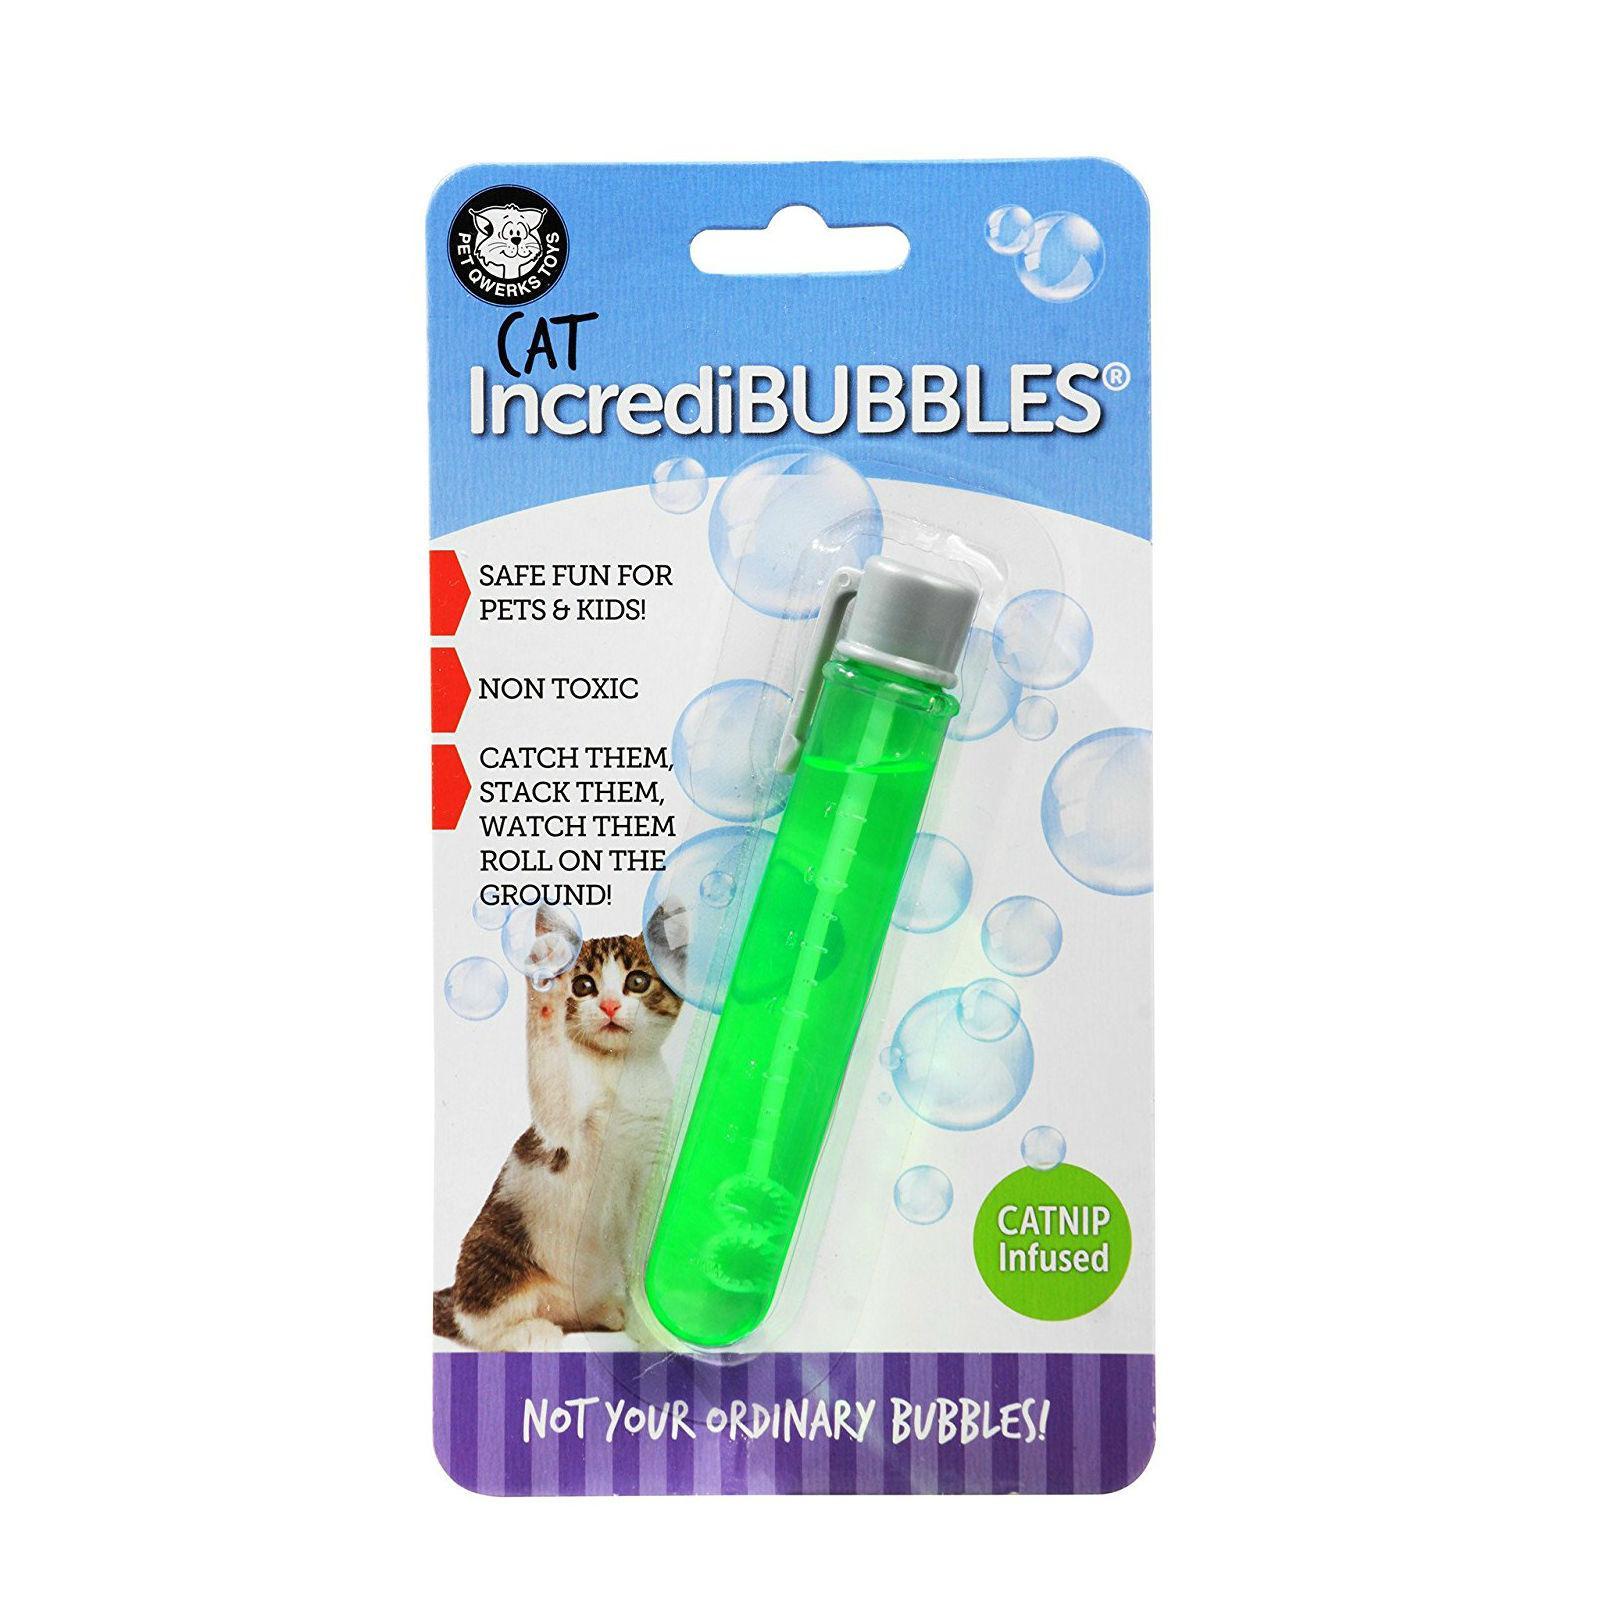 Pet Qwerks Cat Incredibubbles Catnip Flavored Bubbles